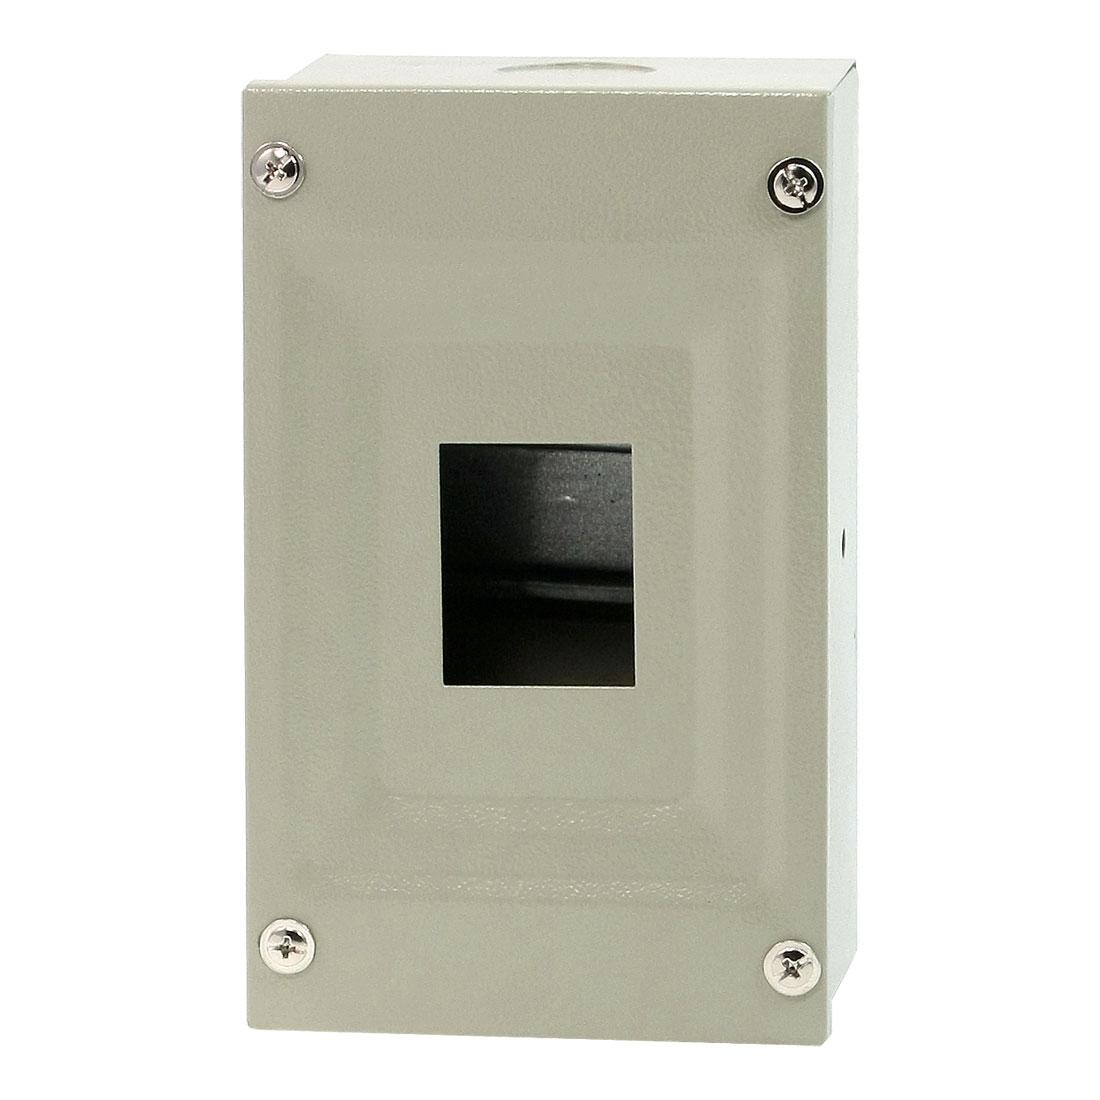 Rectangular Gray Metal Main Distribution Box Guard Cover for Factory